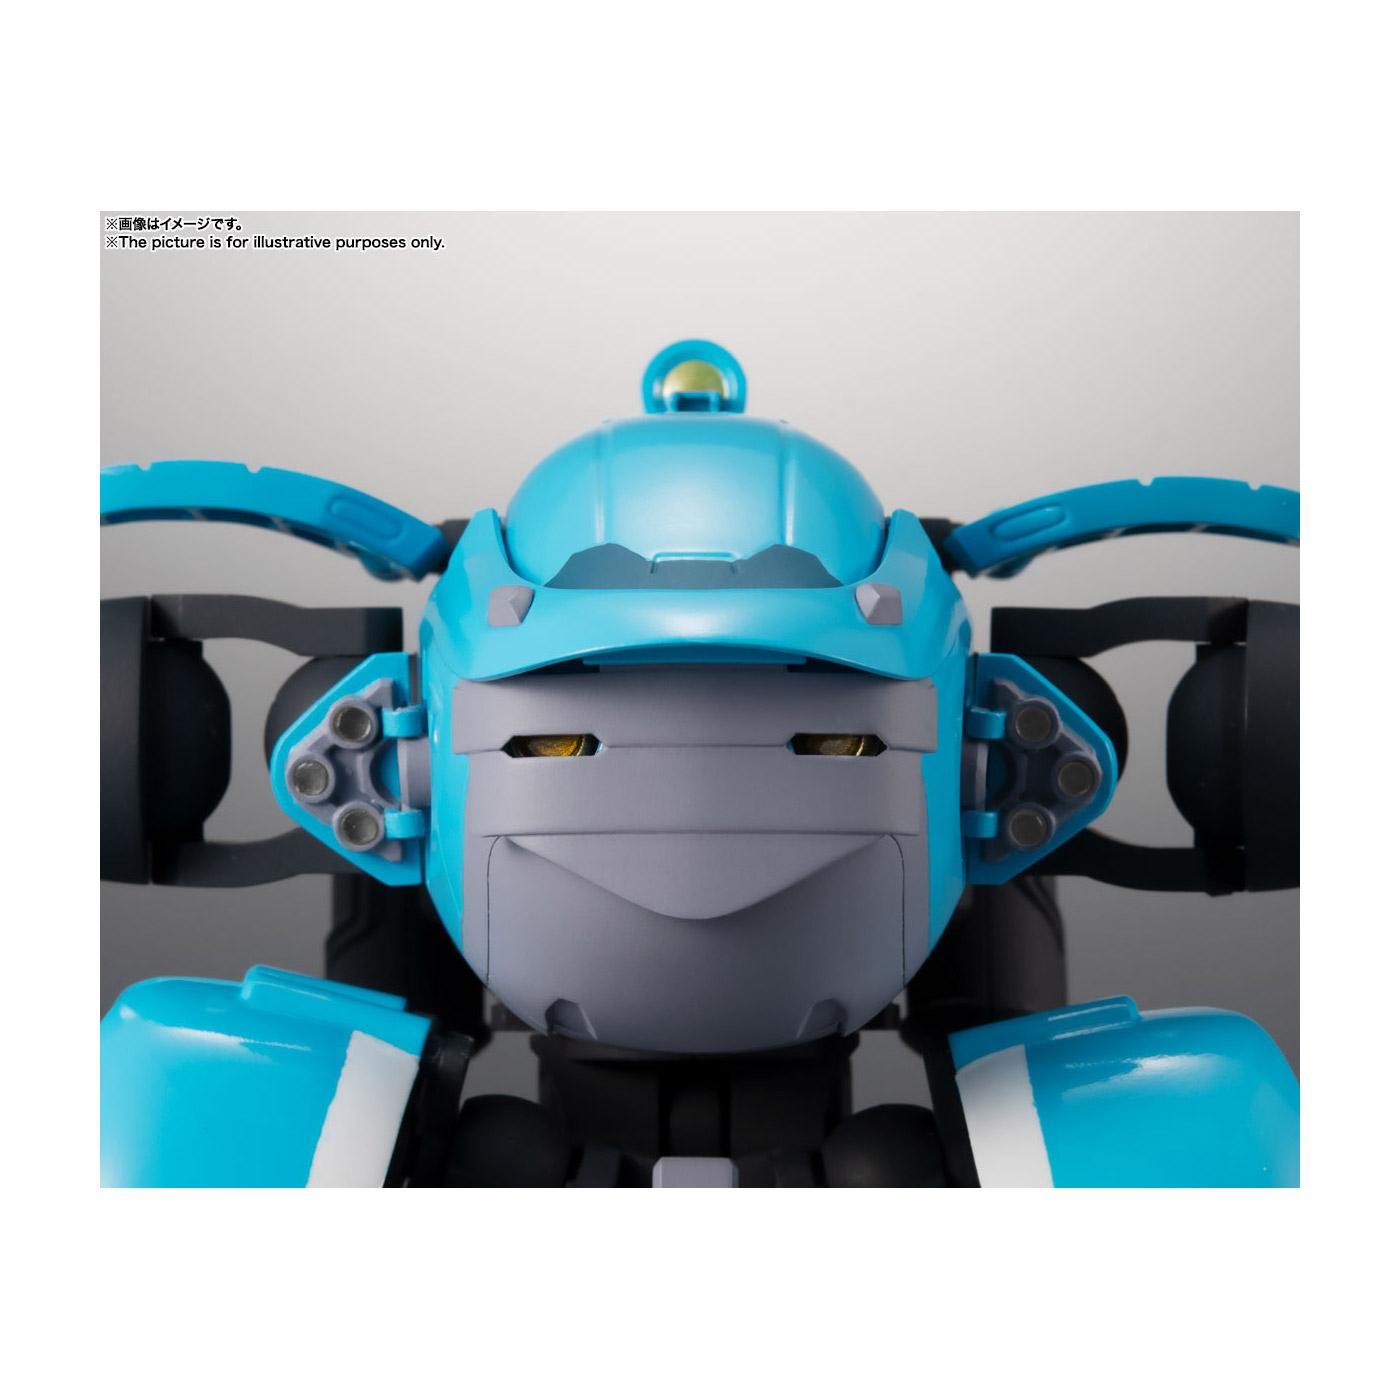 ROBOT魂 [SIDE MB] サクガン ビッグトニー_11